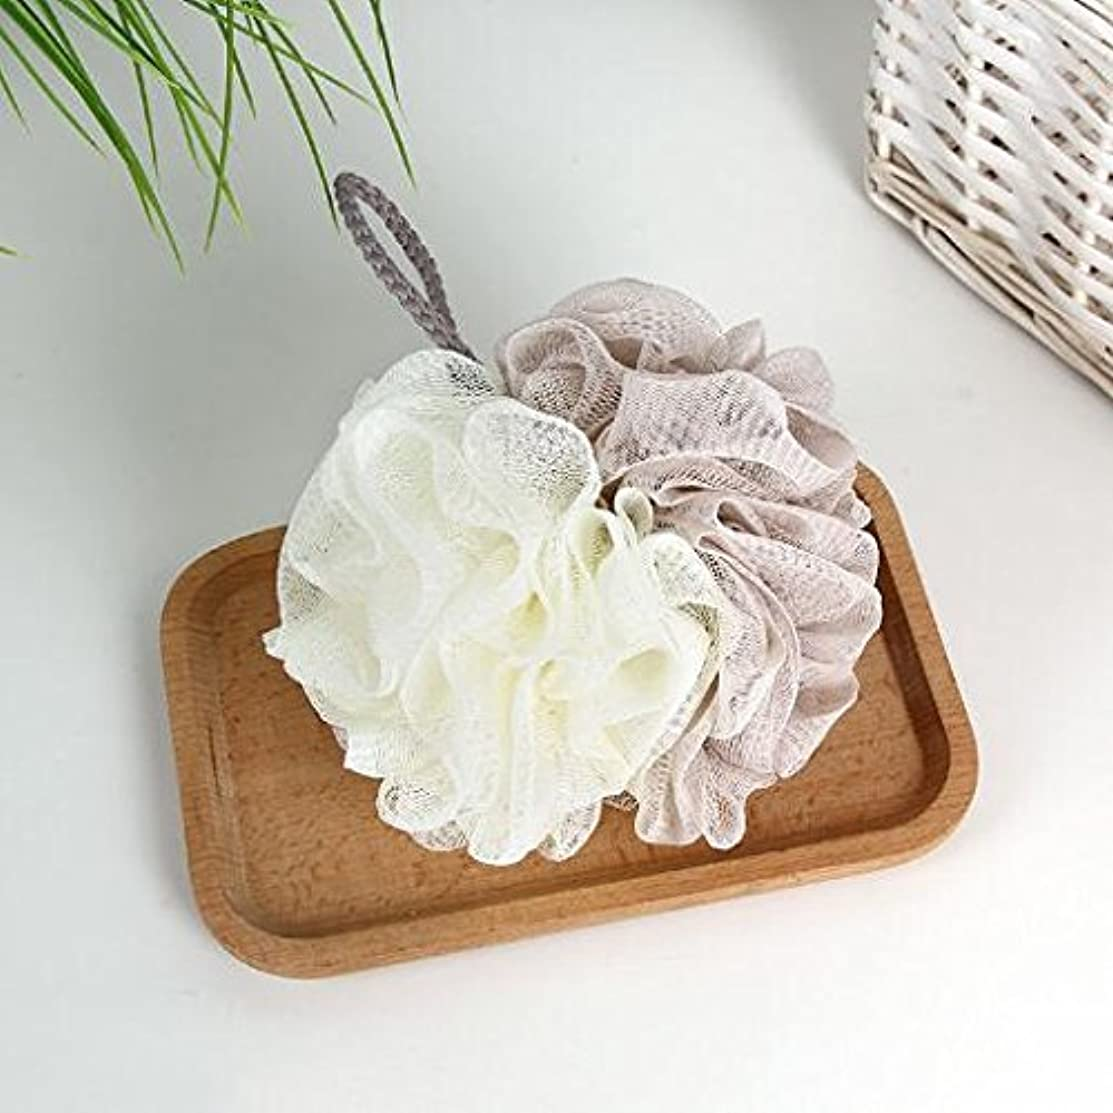 [Chinryou] 泡立てネット ボディースポンジ 柔らかい 花形 お風呂用 ボールボディ用 シャボンボール 背中も洗える 泡肌美人 ふわわん (アプリコット)